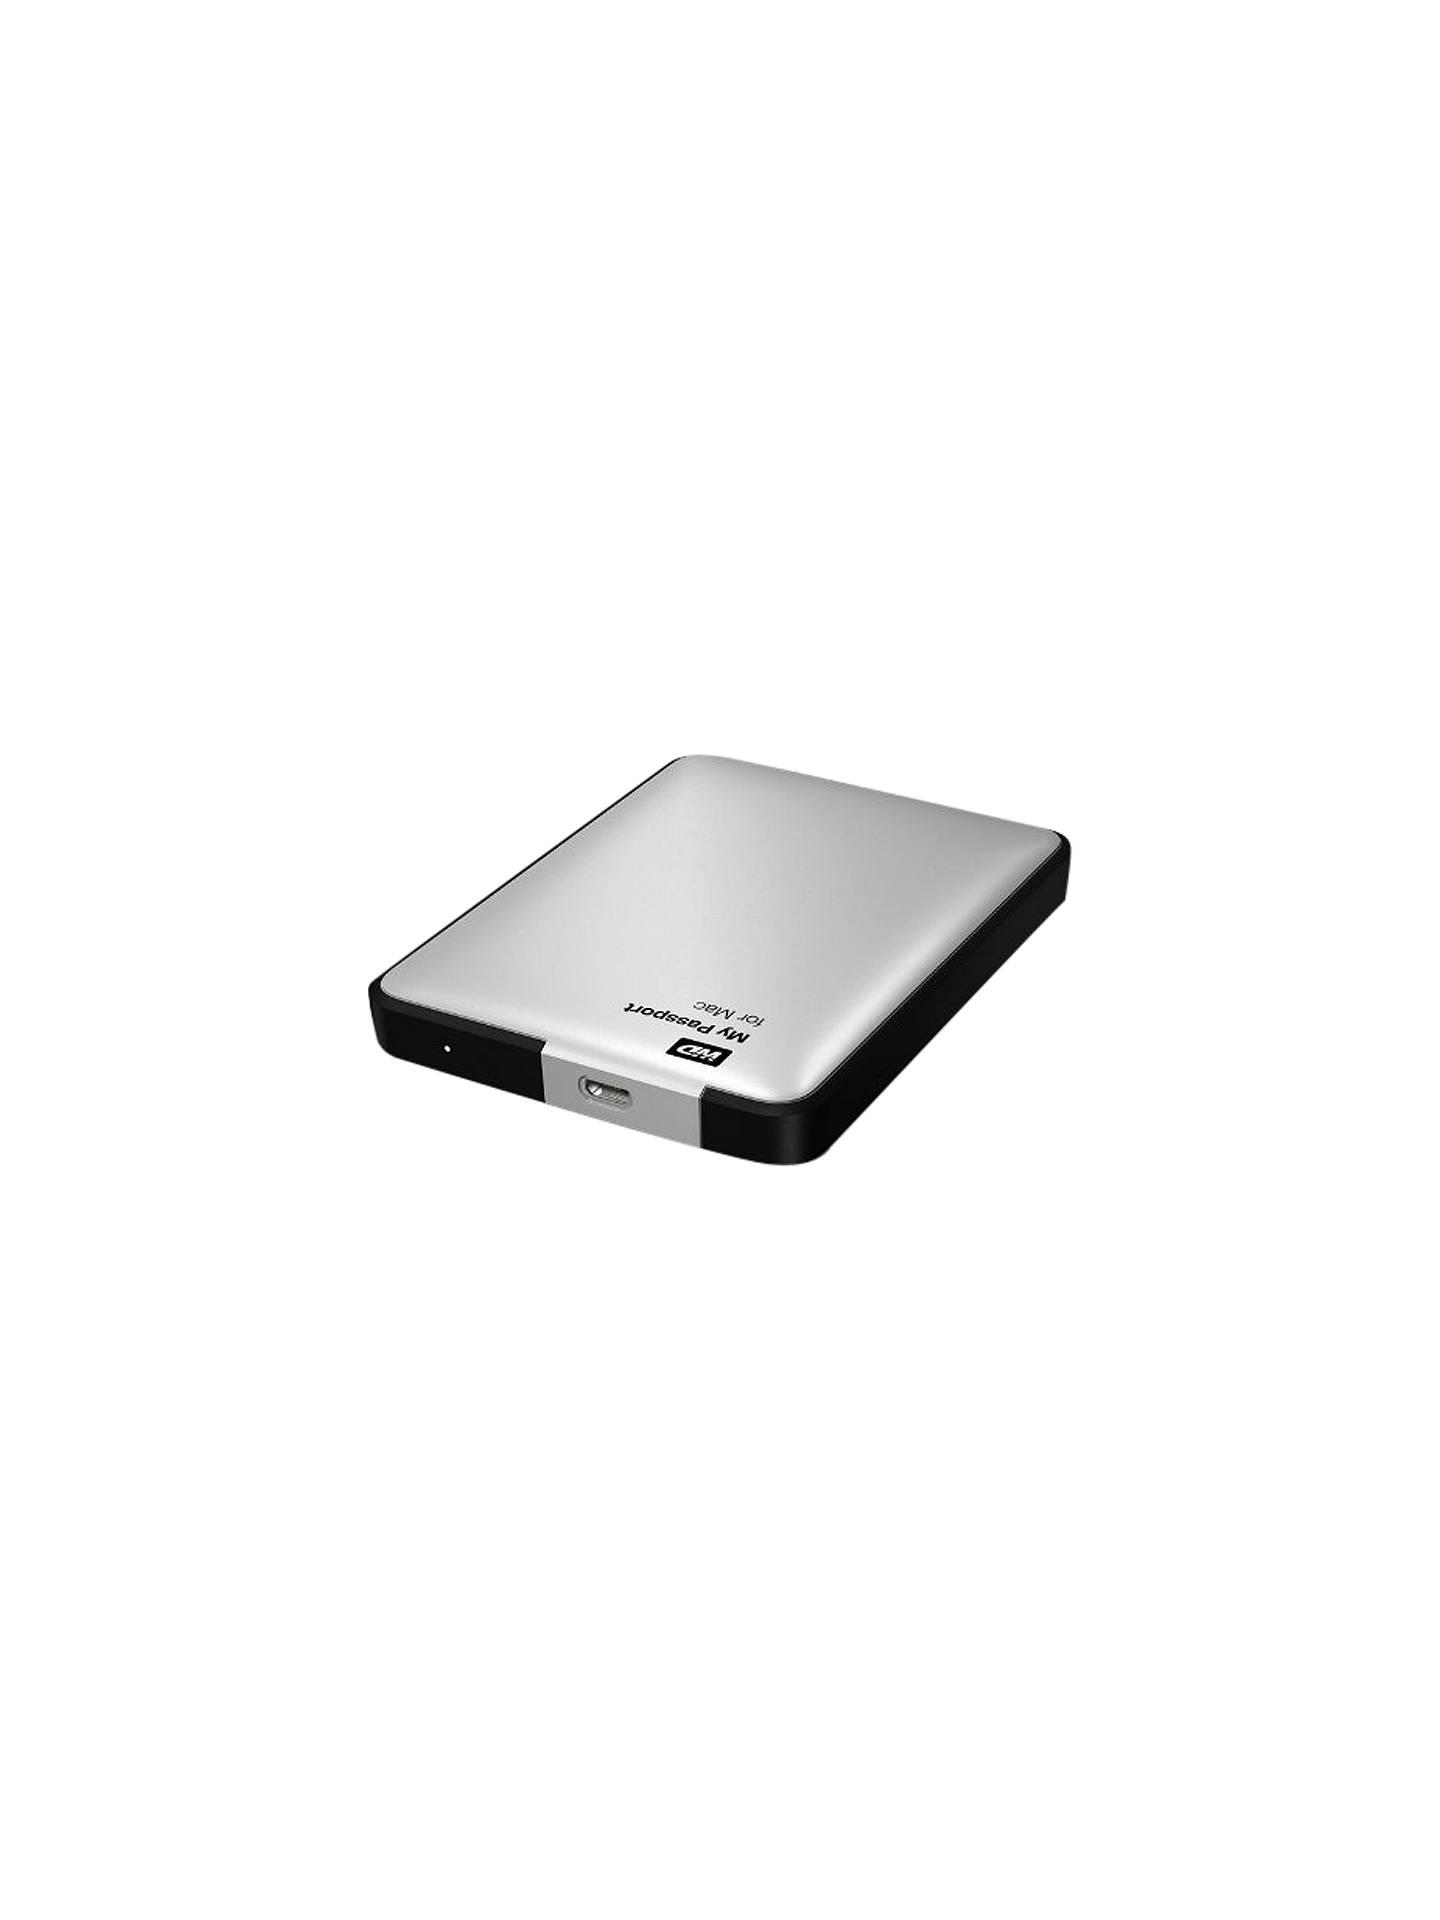 WD My Passport for Mac Portable Hard Drive, USB 3 0, 500GB